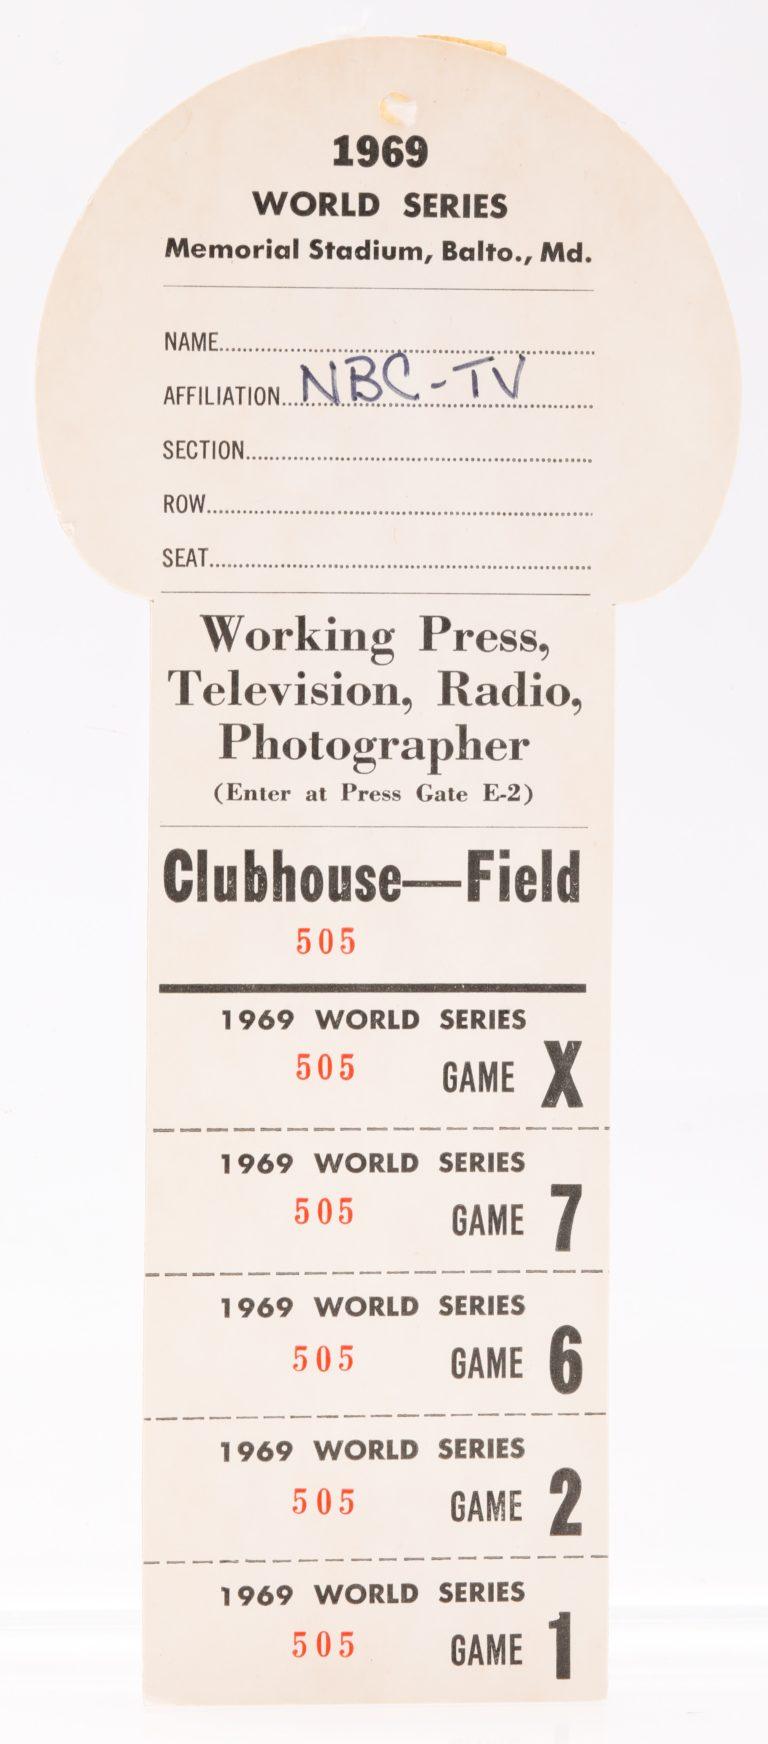 1969 World Series Press Pass - Front